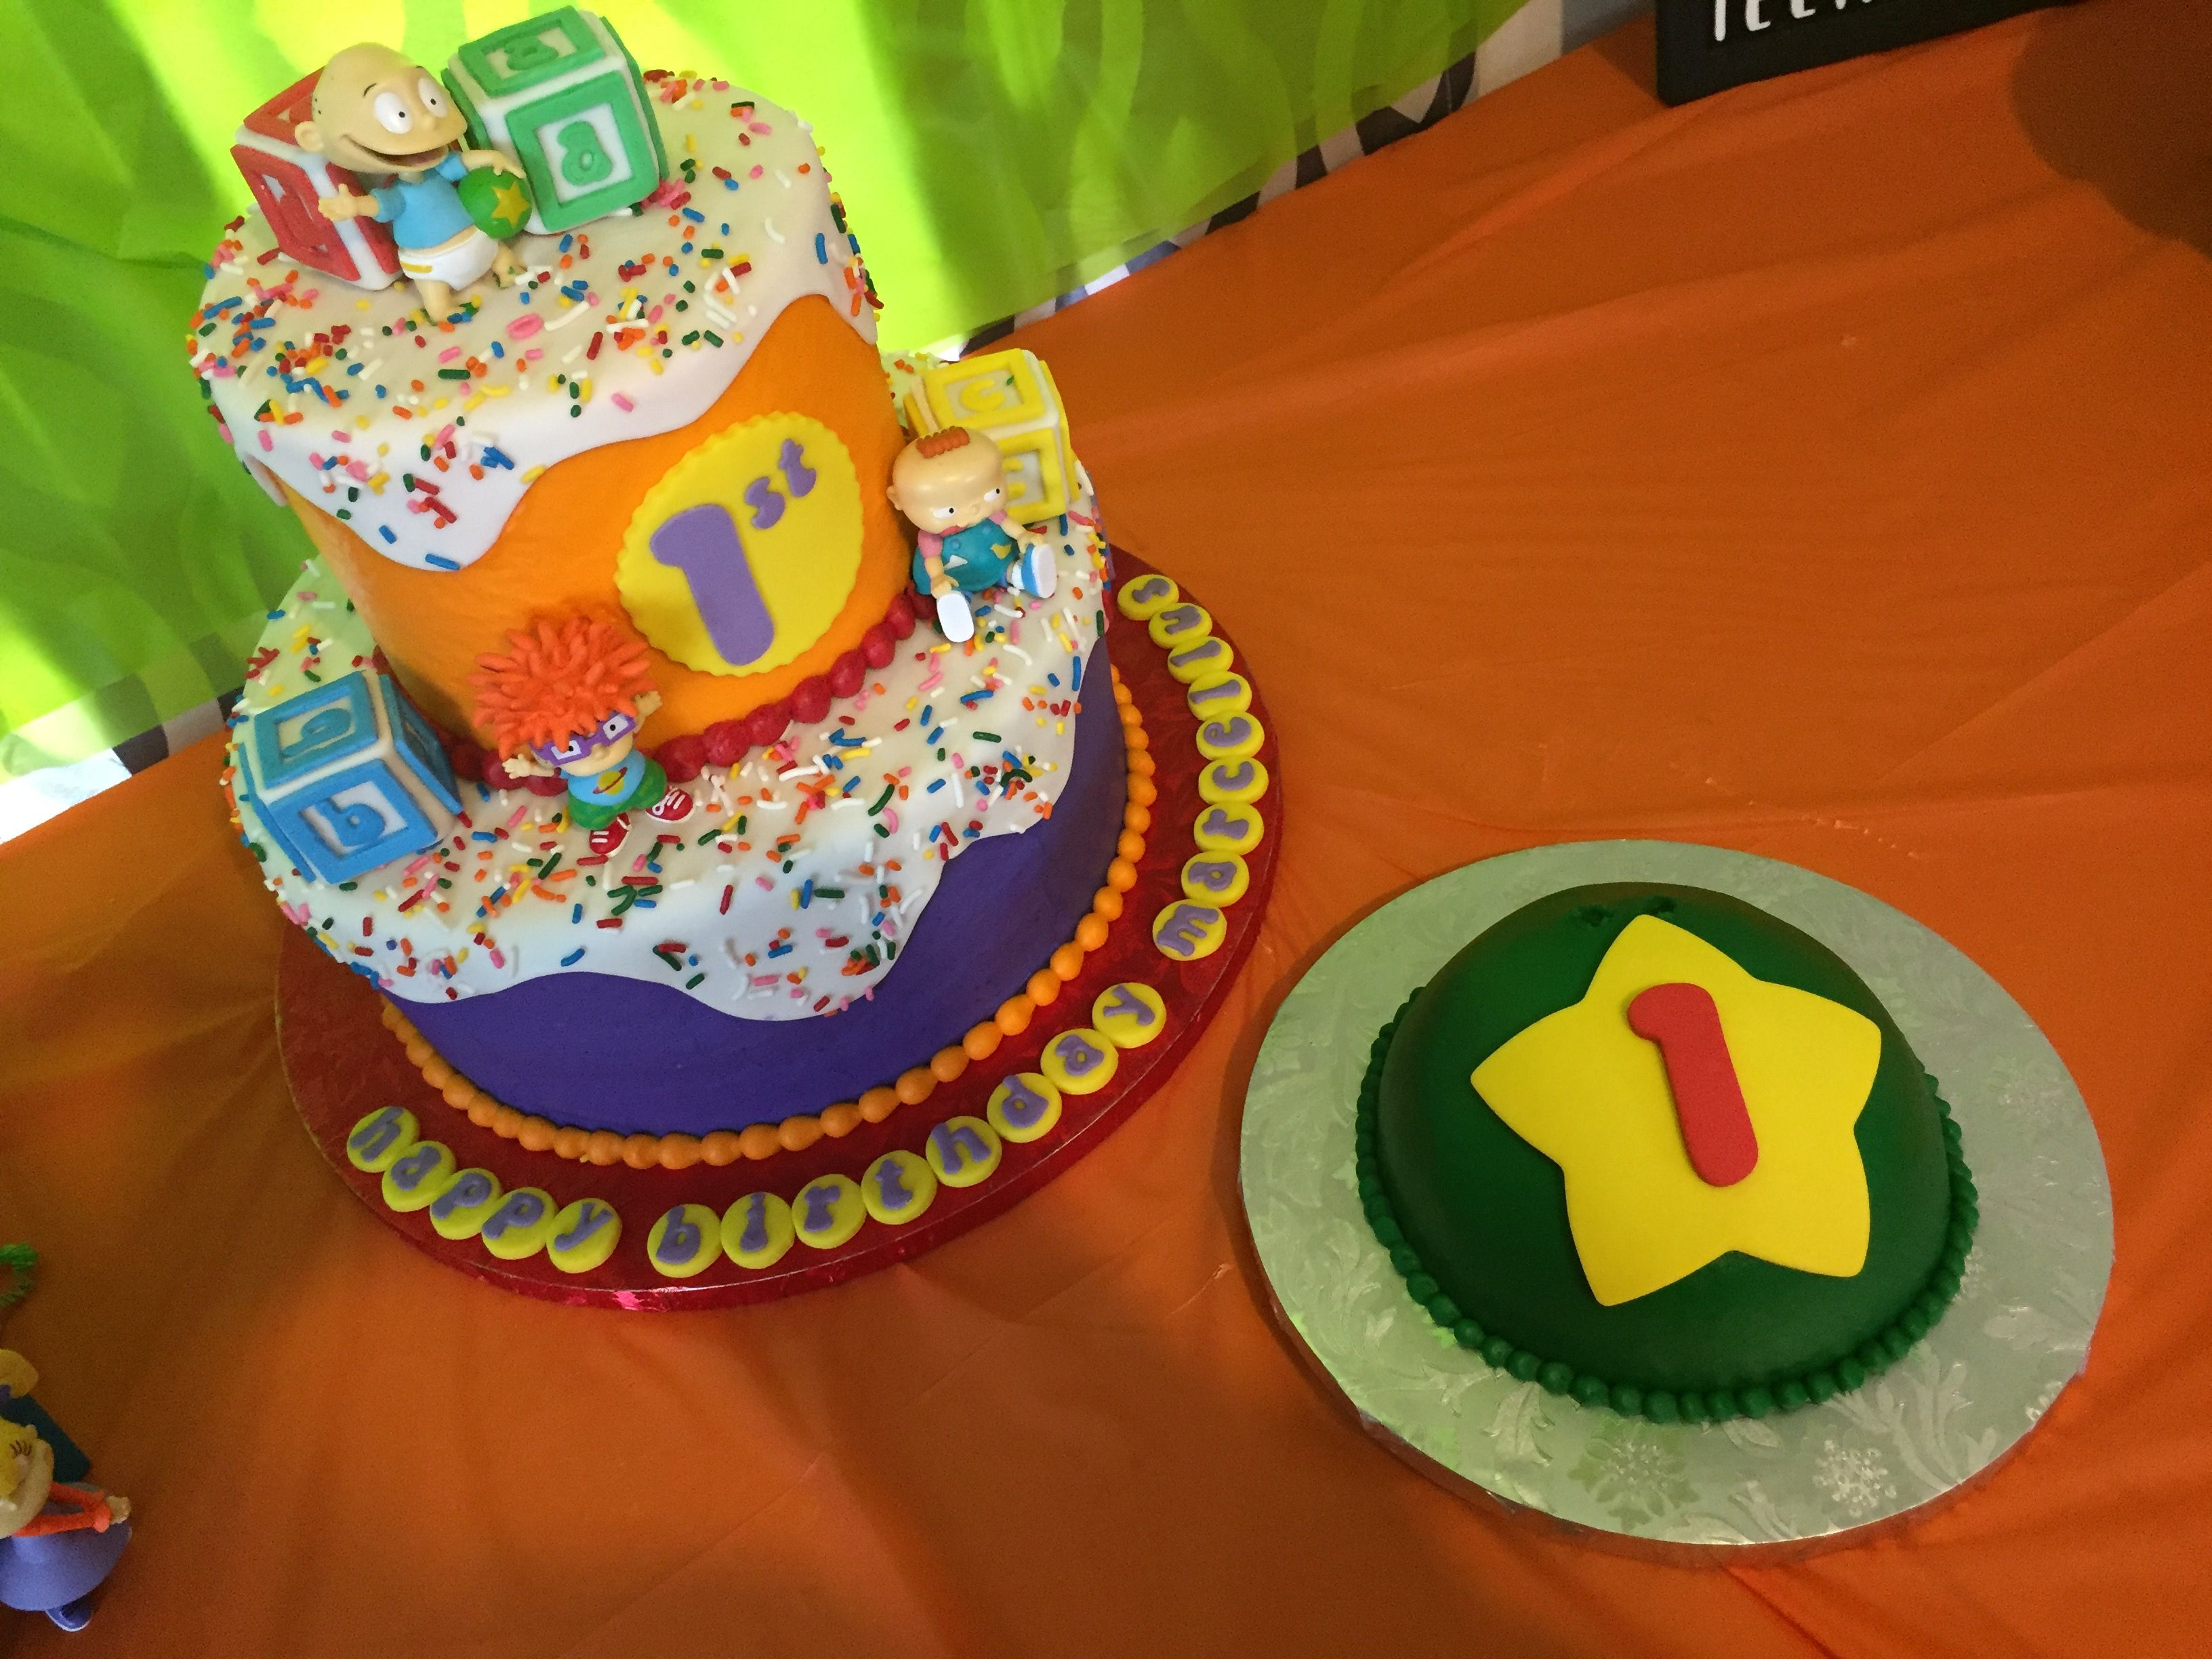 Superb Pin By Bree Blanco On Birthday Party Ideas In 2020 Baby Birthday Funny Birthday Cards Online Necthendildamsfinfo